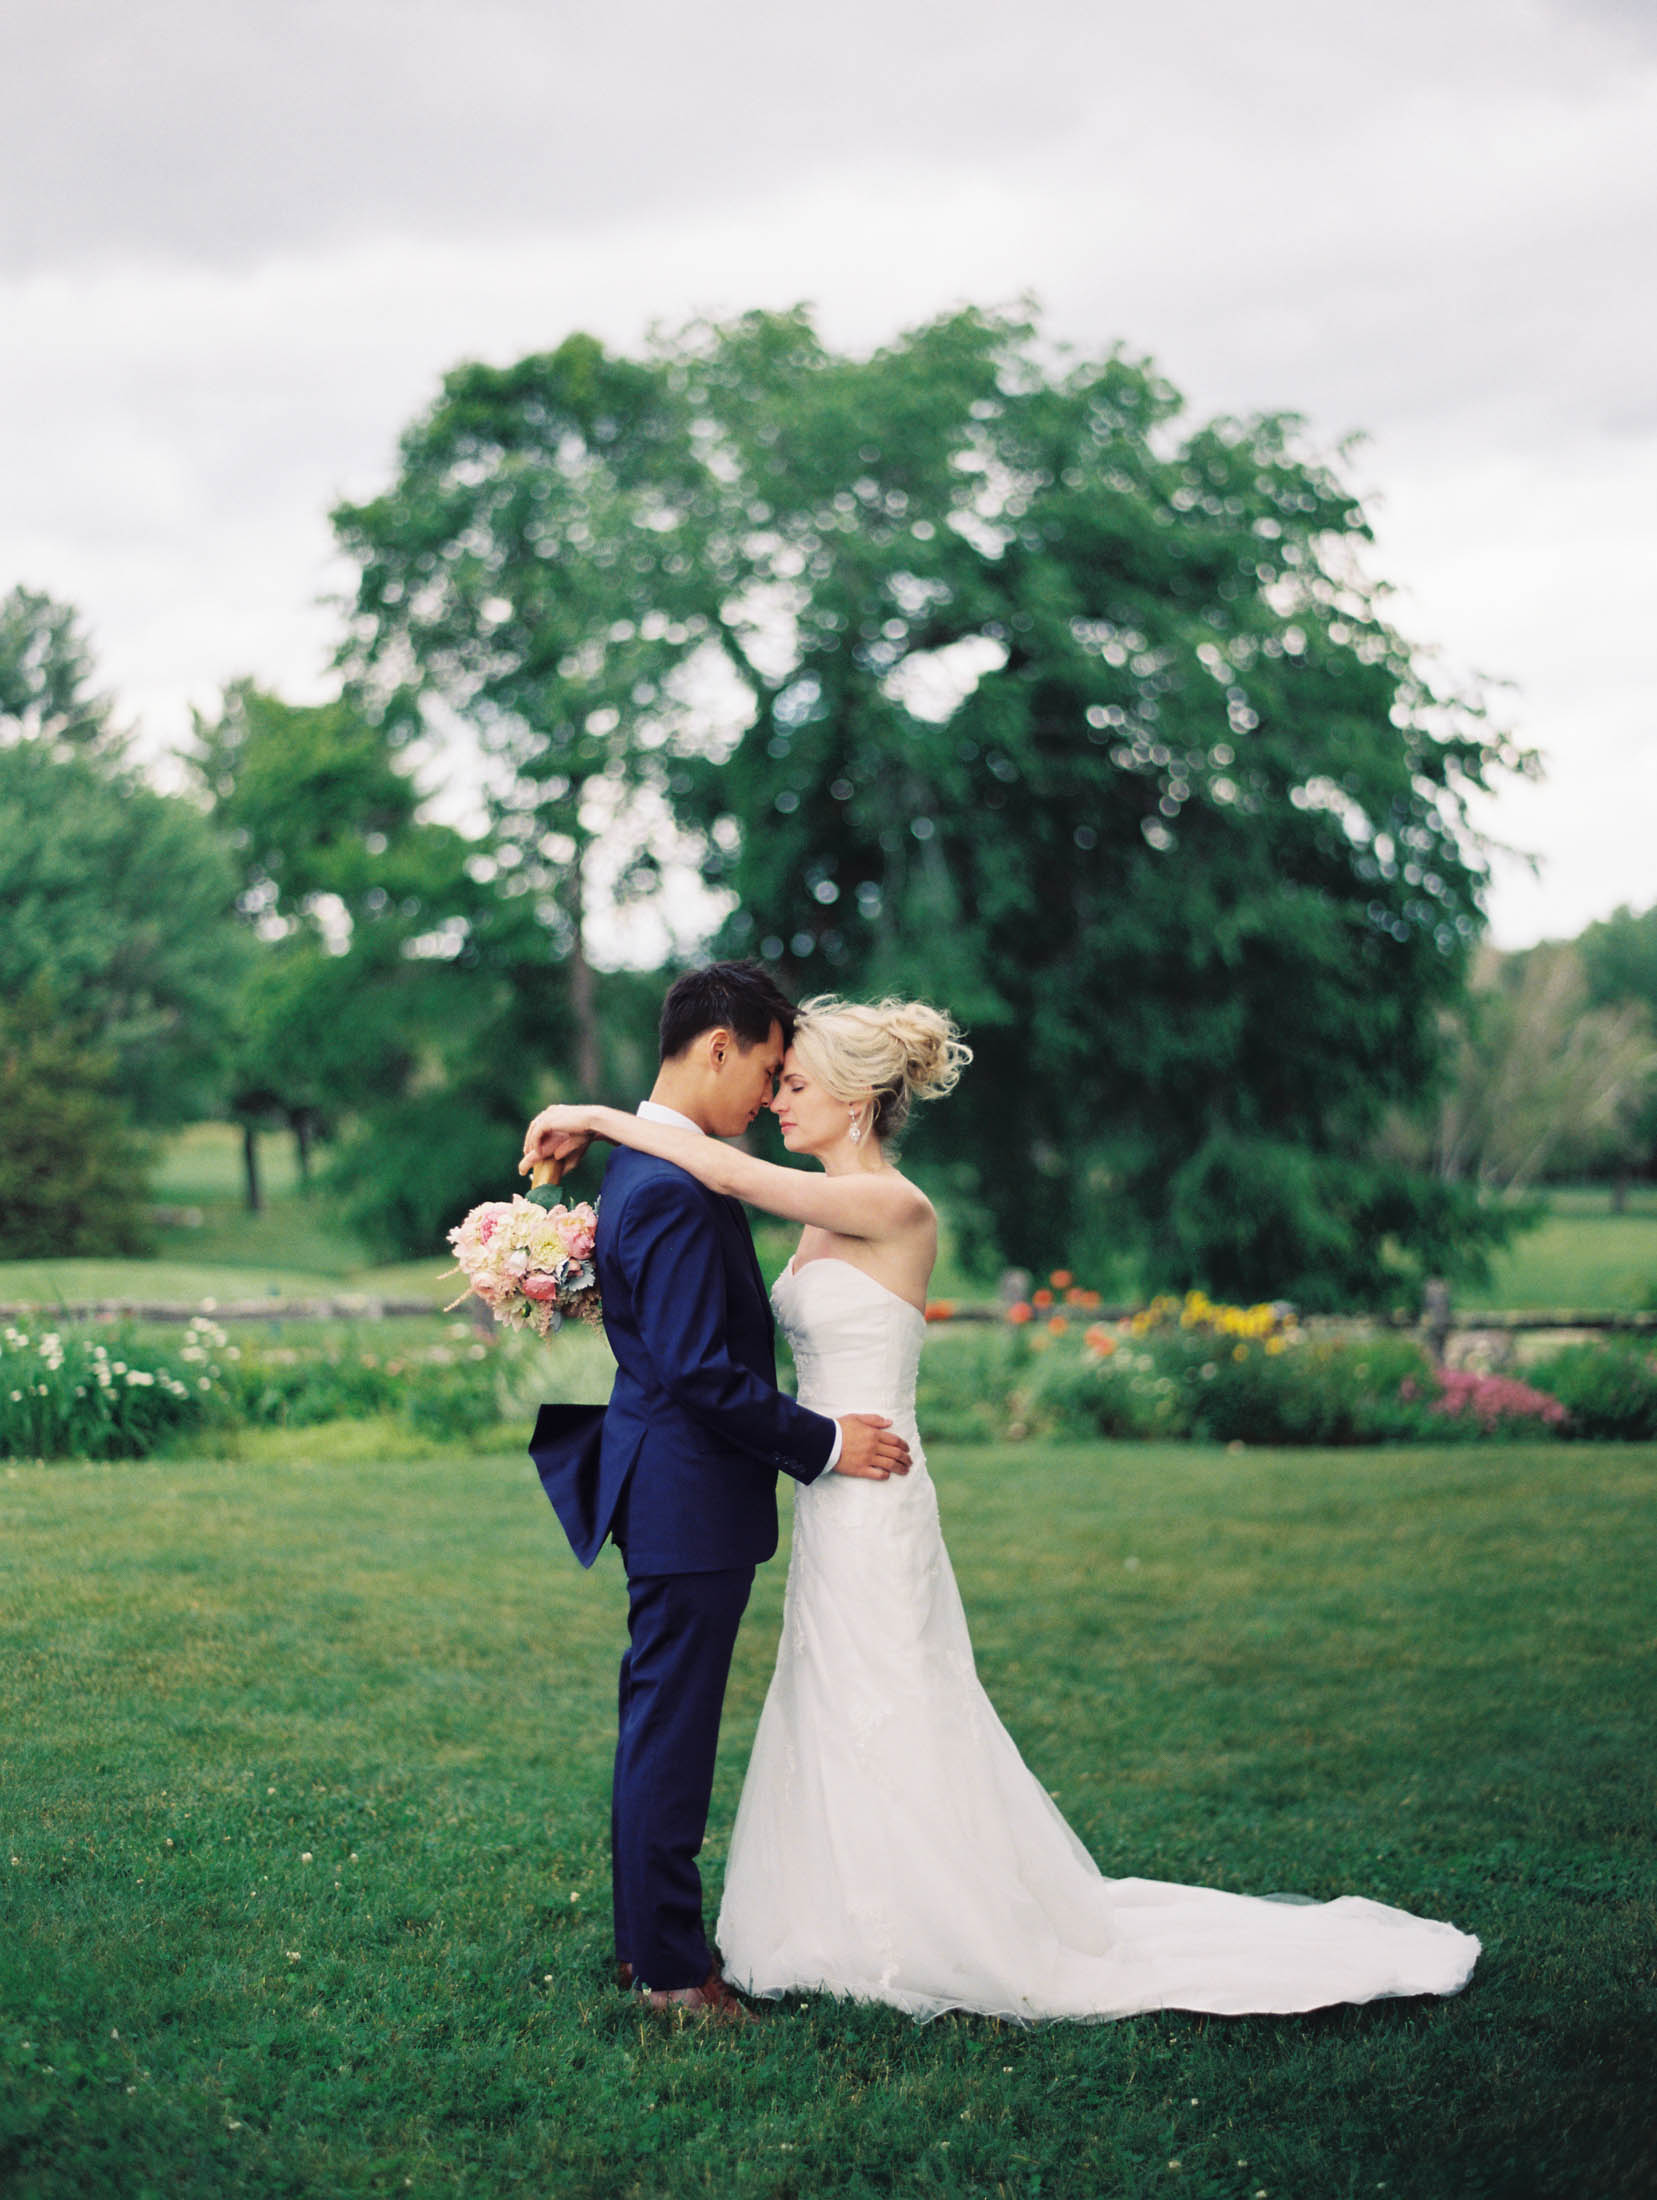 Blissful-Meadows-wedding-32.jpg